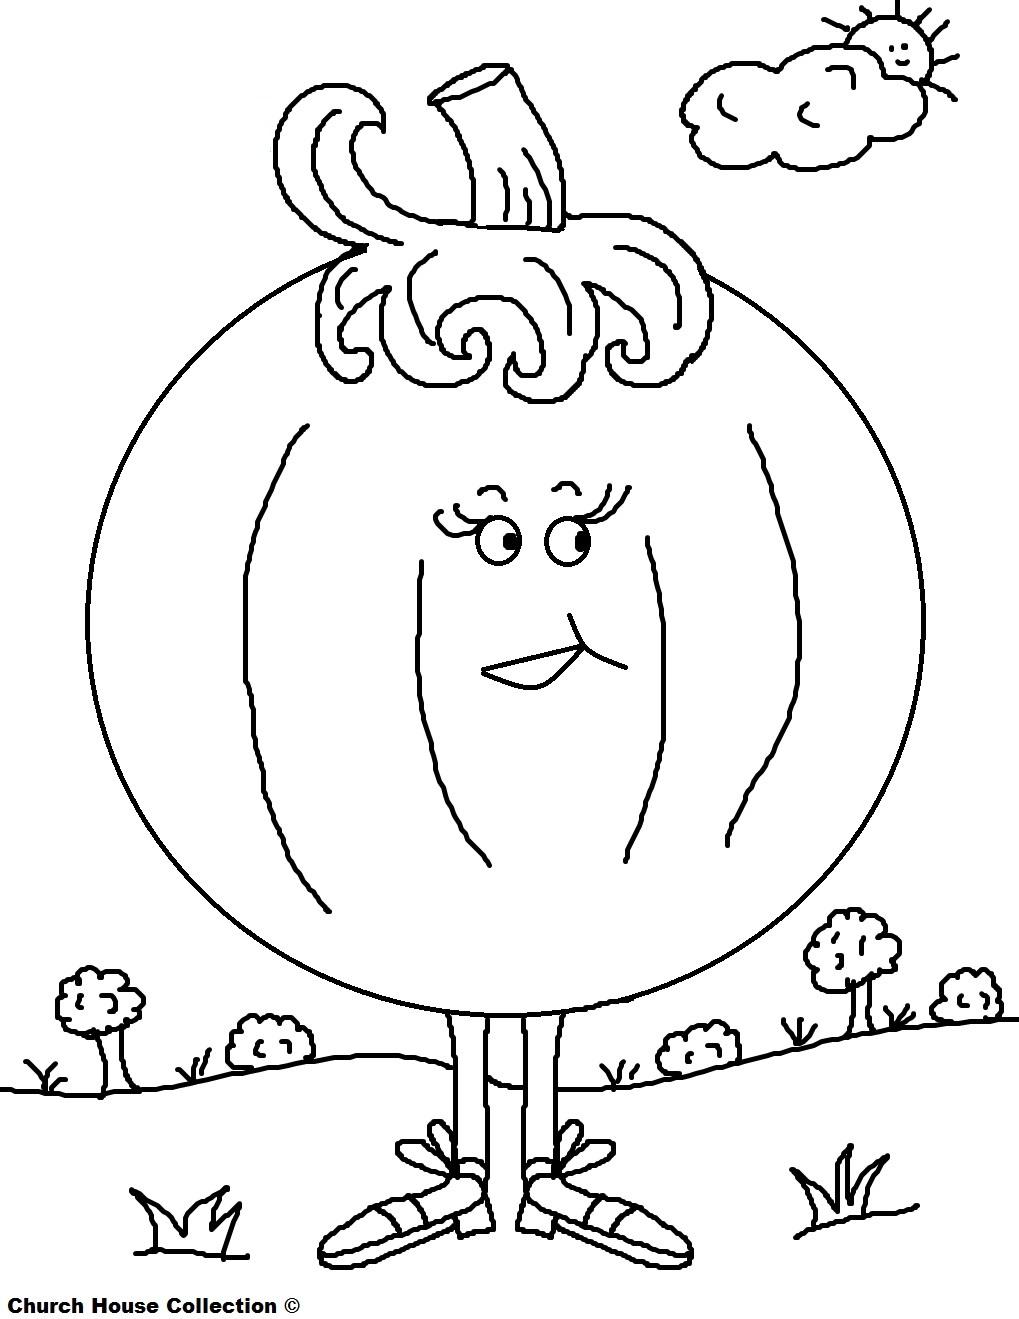 Church House Collection Blog Free Printable Pumpkin Coloring